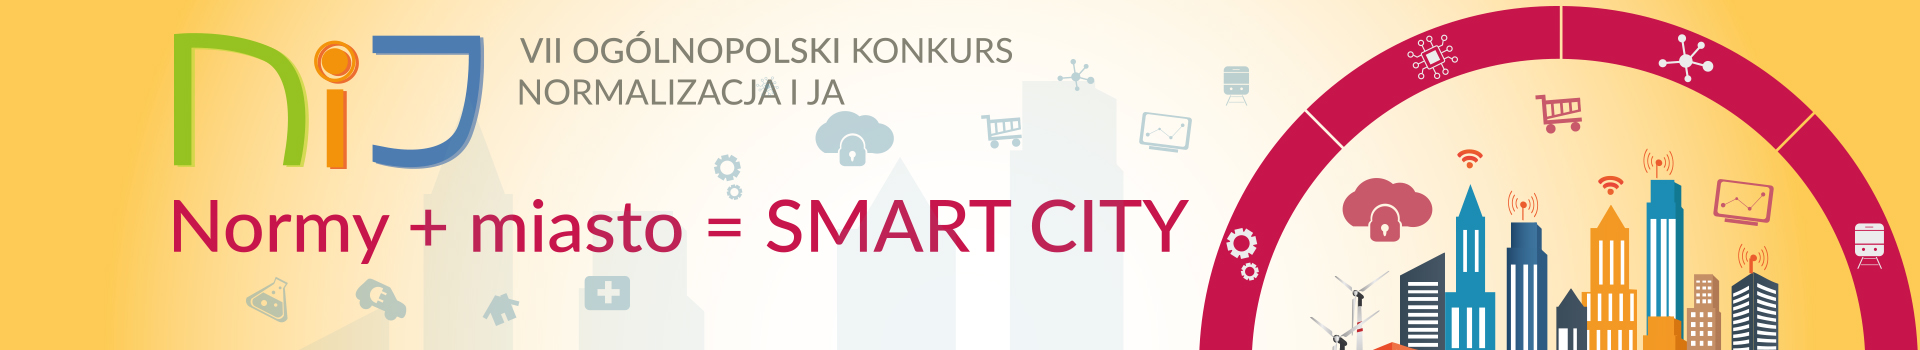 baner - konkurs smart city